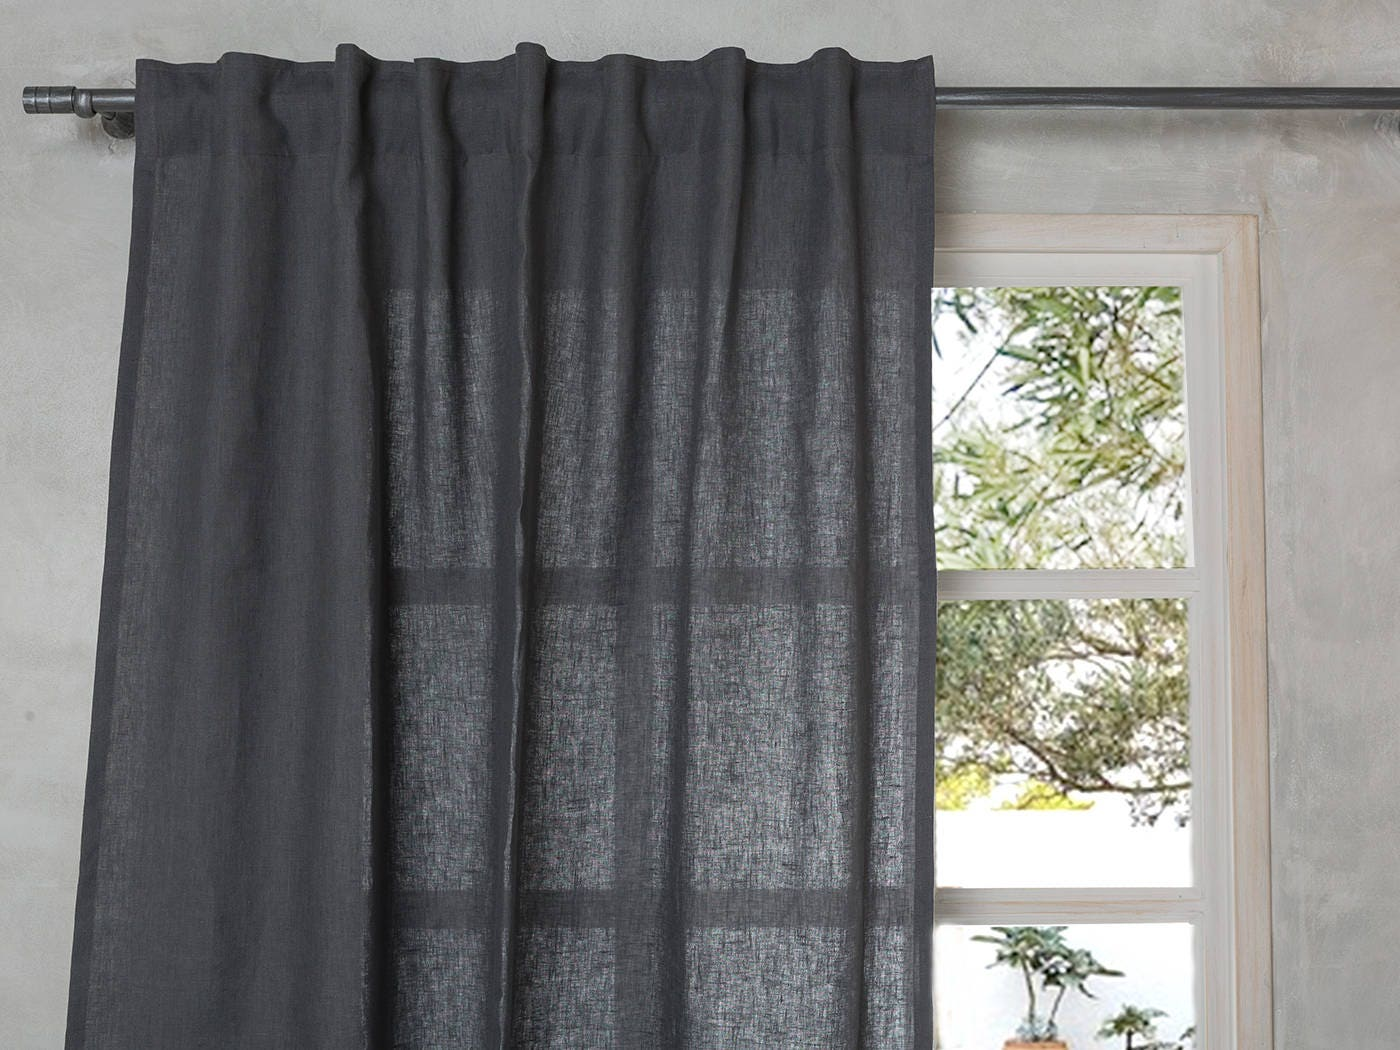 Linen Curtain Linen Drape Linen Panel In Dark Grey Linen Panel With Hidden Back Tabs Custom Lengthxwidth55 140cm